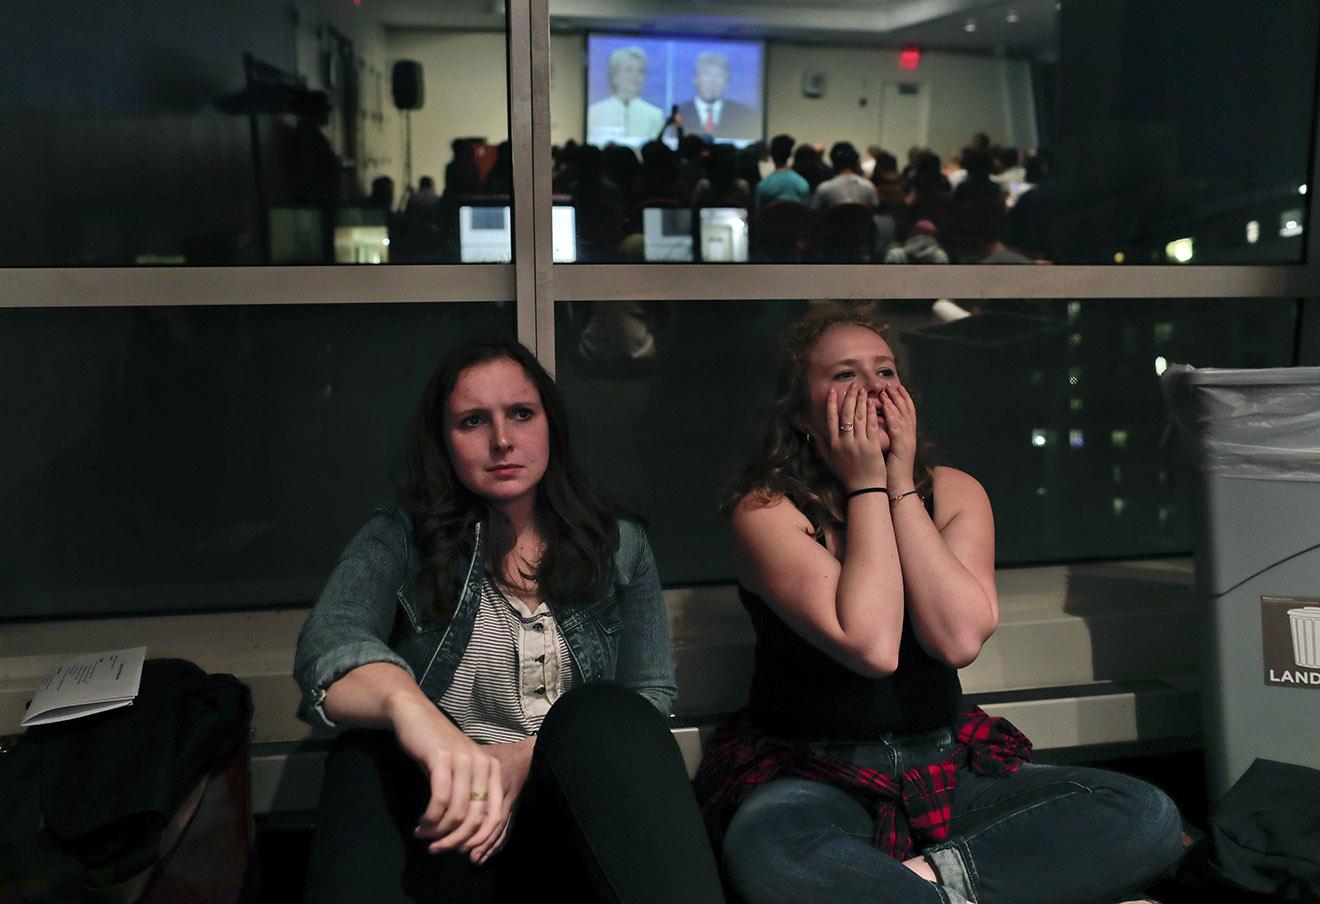 Фото: Julie Jacobson / AP